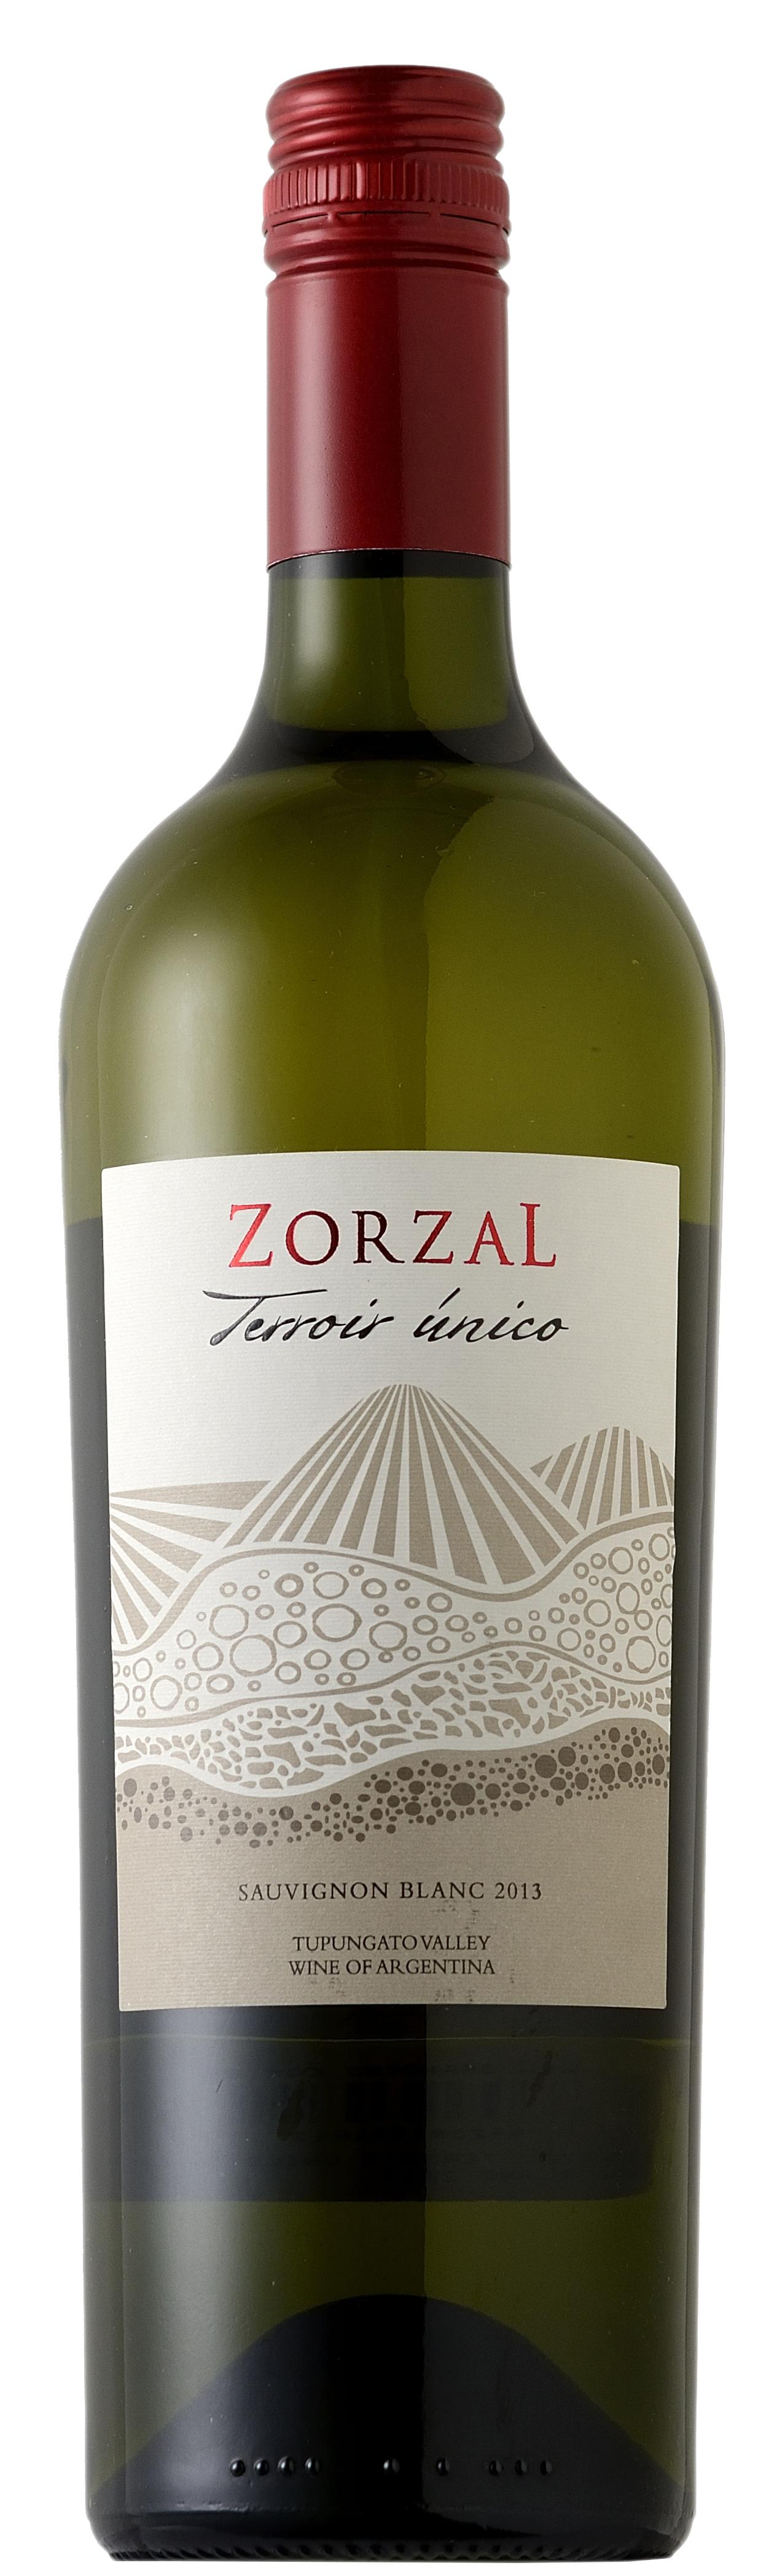 Vinho Zorzal Terroir Único Sauvignon Blanc 2015 - Grand Cru